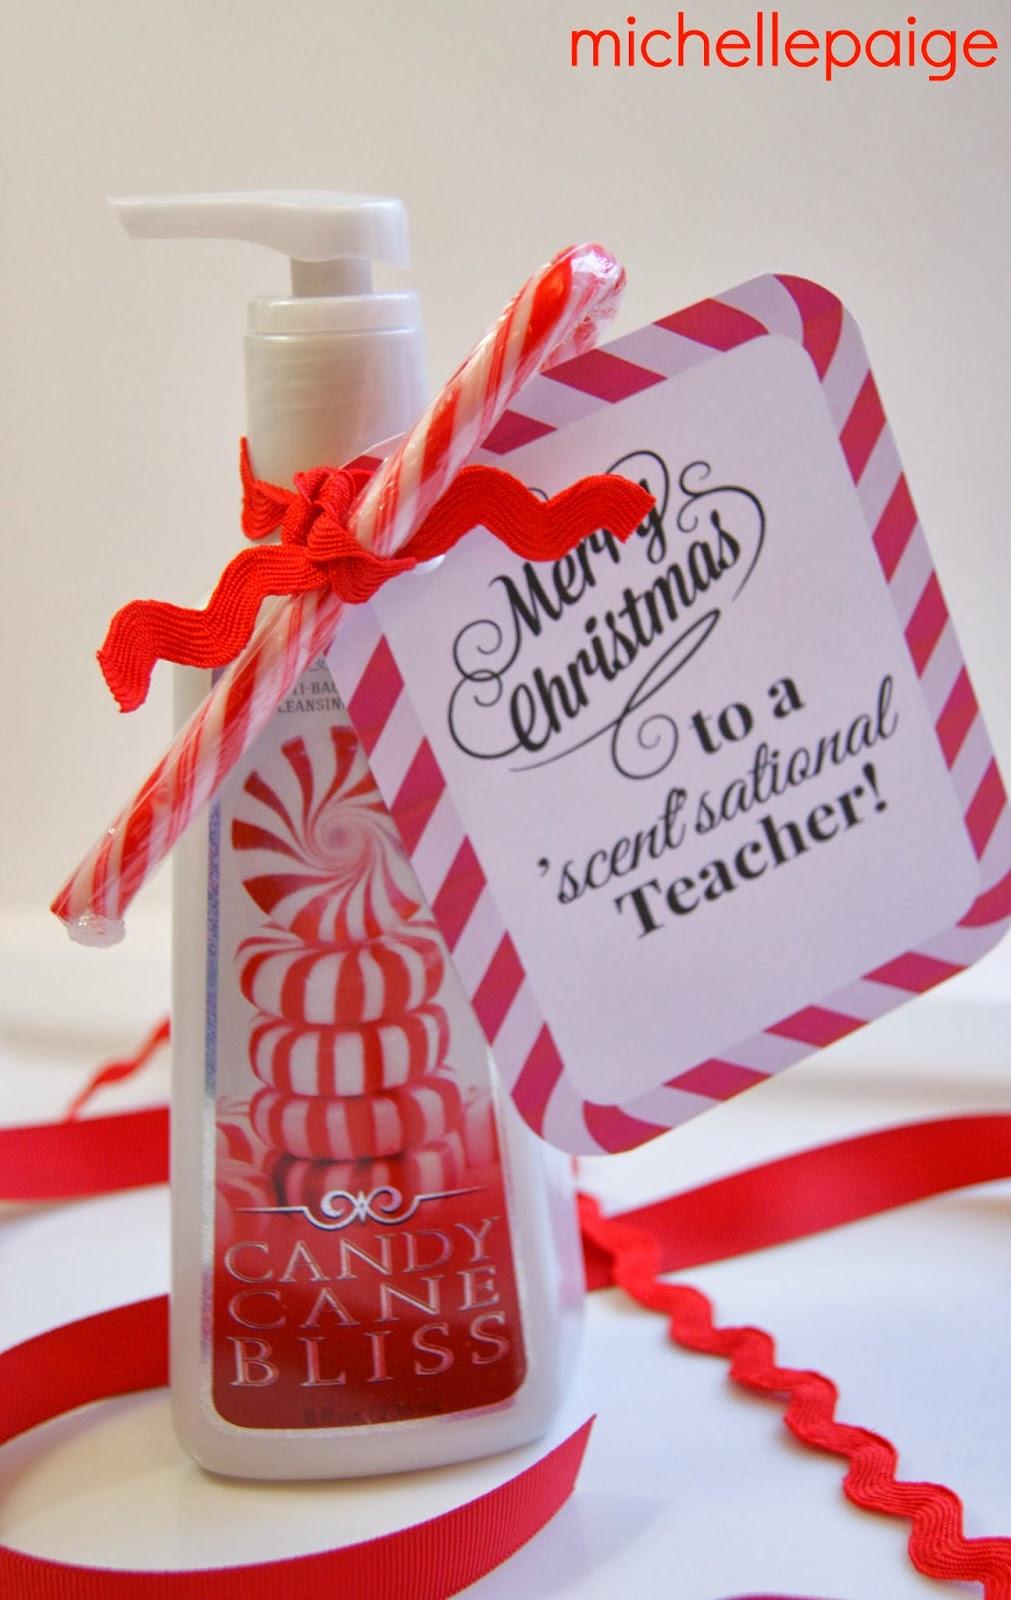 Teacher Christmas Gift Ideas  michelle paige blogs Quick Teacher Soap Gift for Christmas